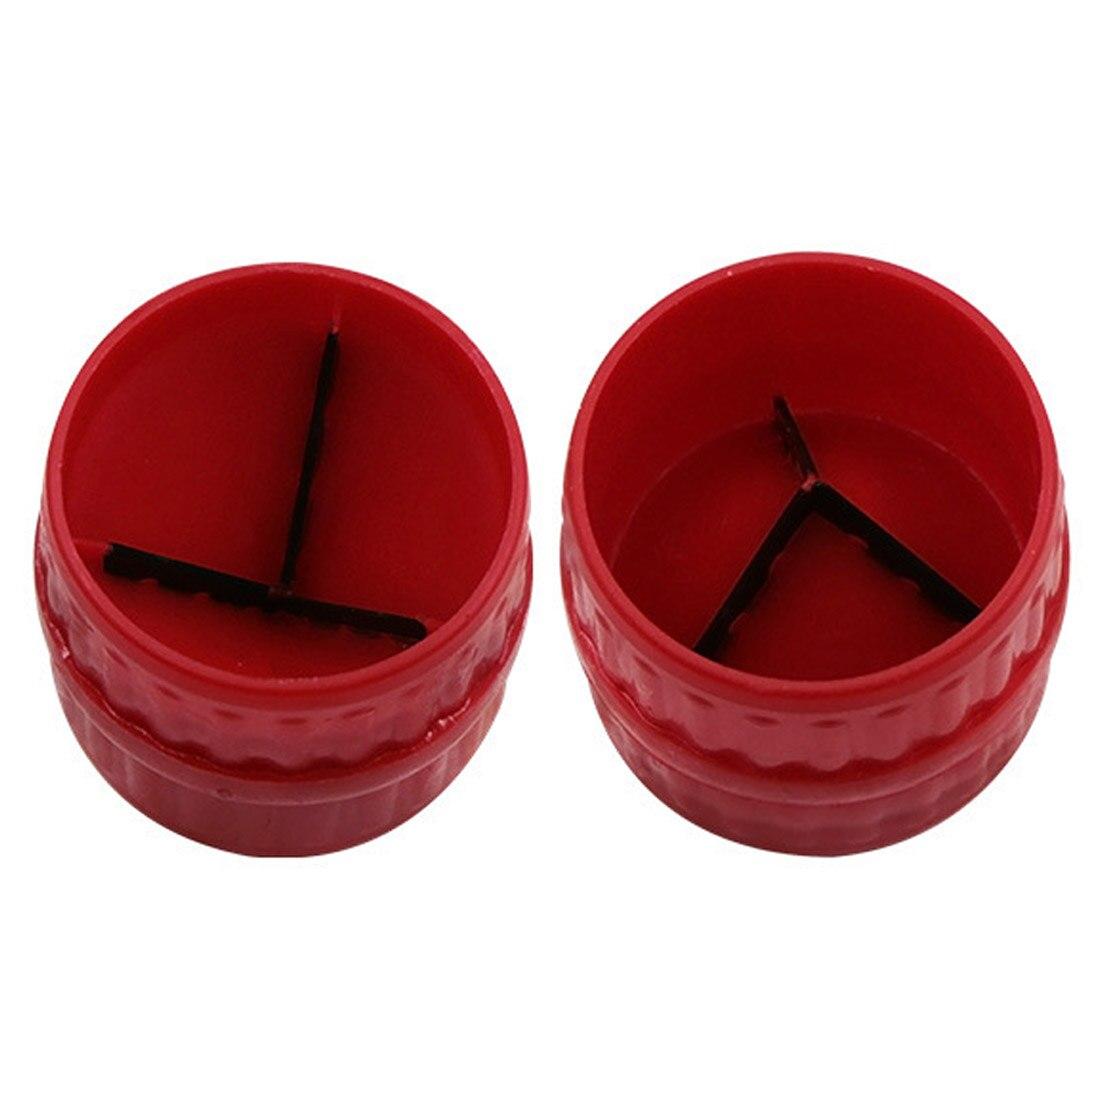 Metal Tubes Heavy Duty Deburring Tool 5mm-38mm Internal External Tube Pipes For PVC Copper Aluminium Steel Pipe Tube